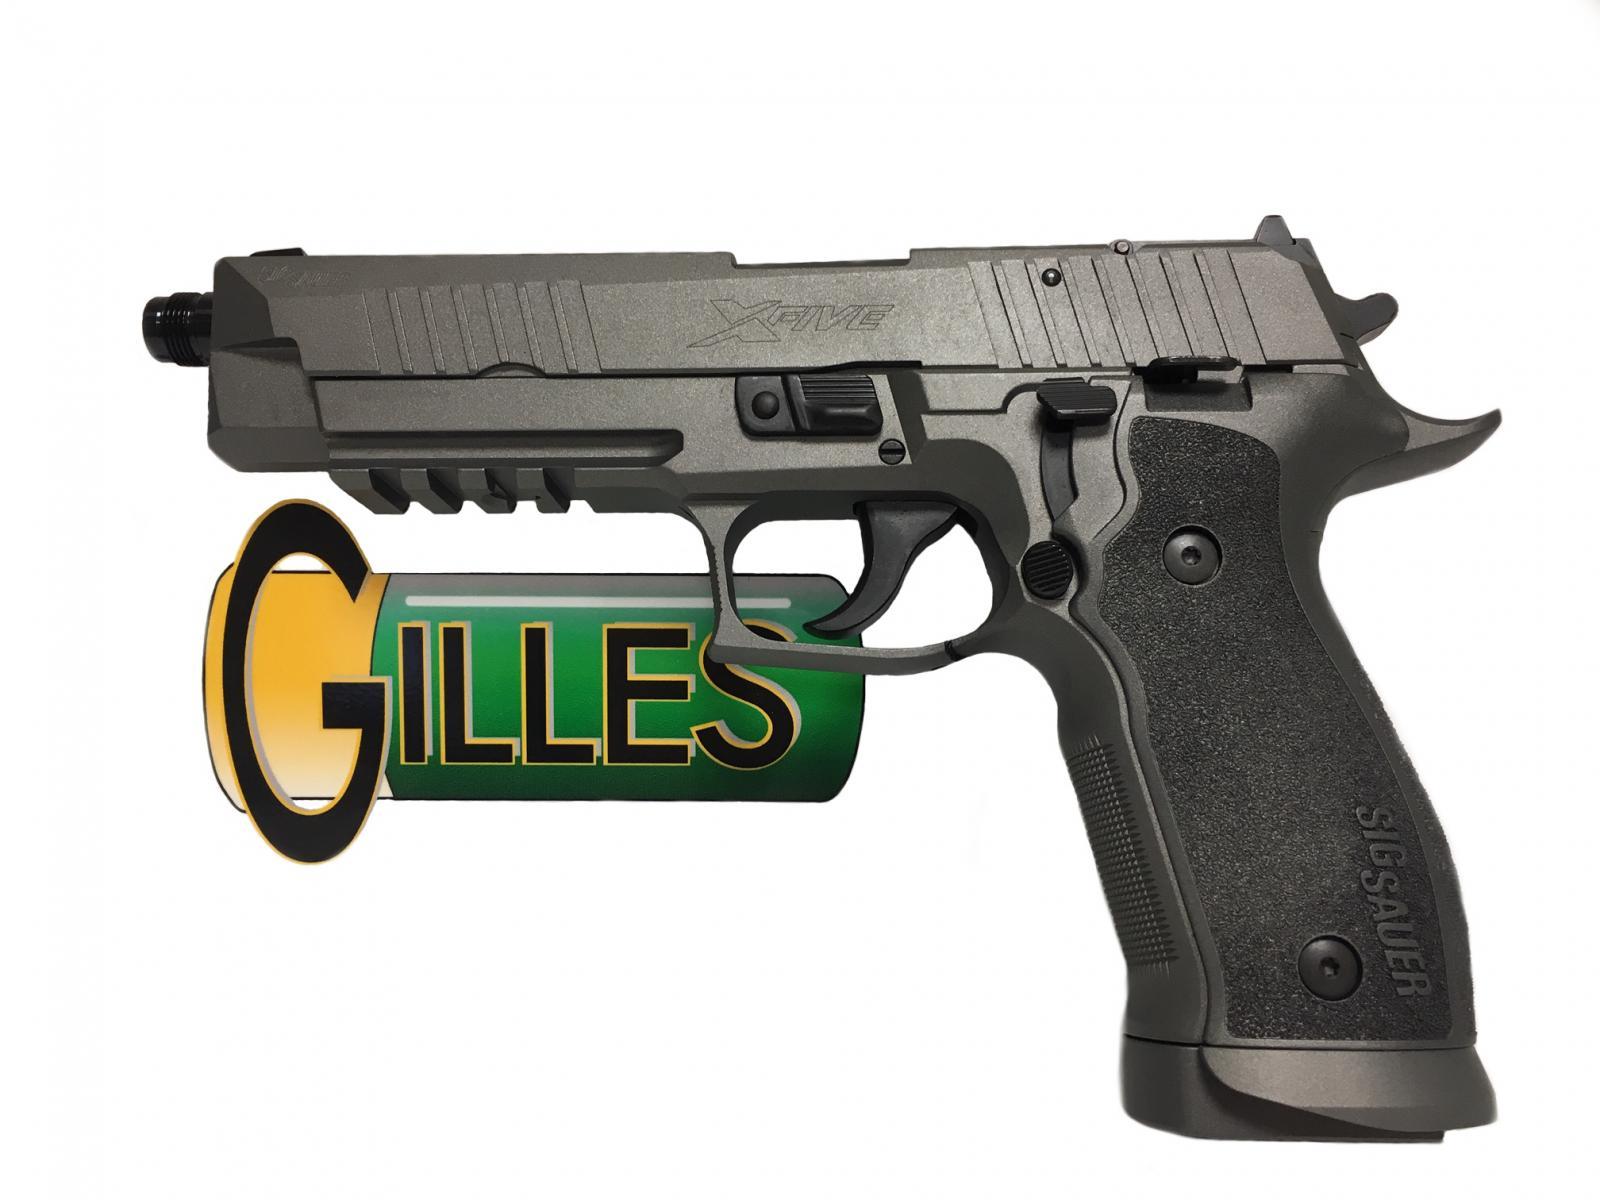 P226 XFIVE TAC cal 9mm GRIS